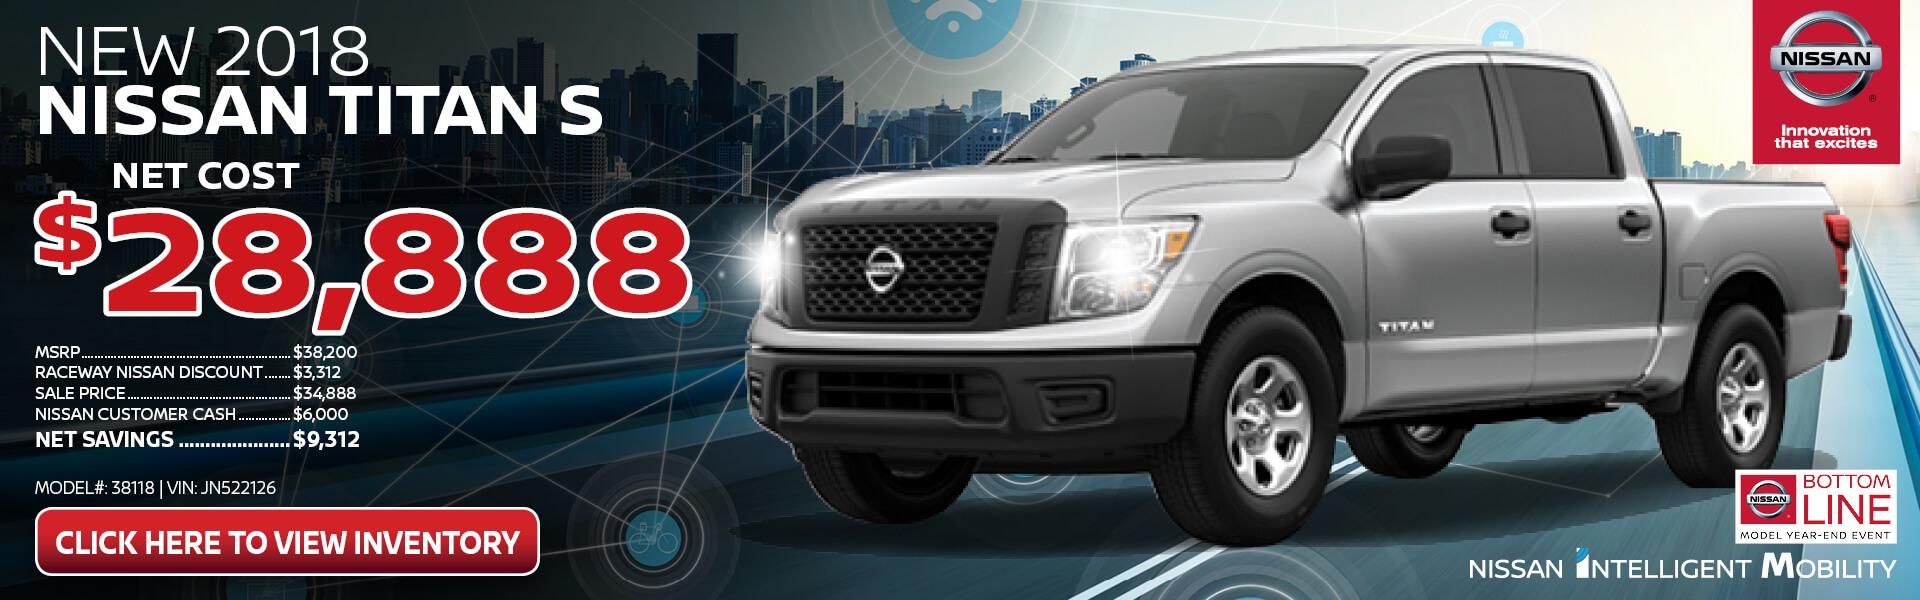 Nissan Titan $28,888 Purchase